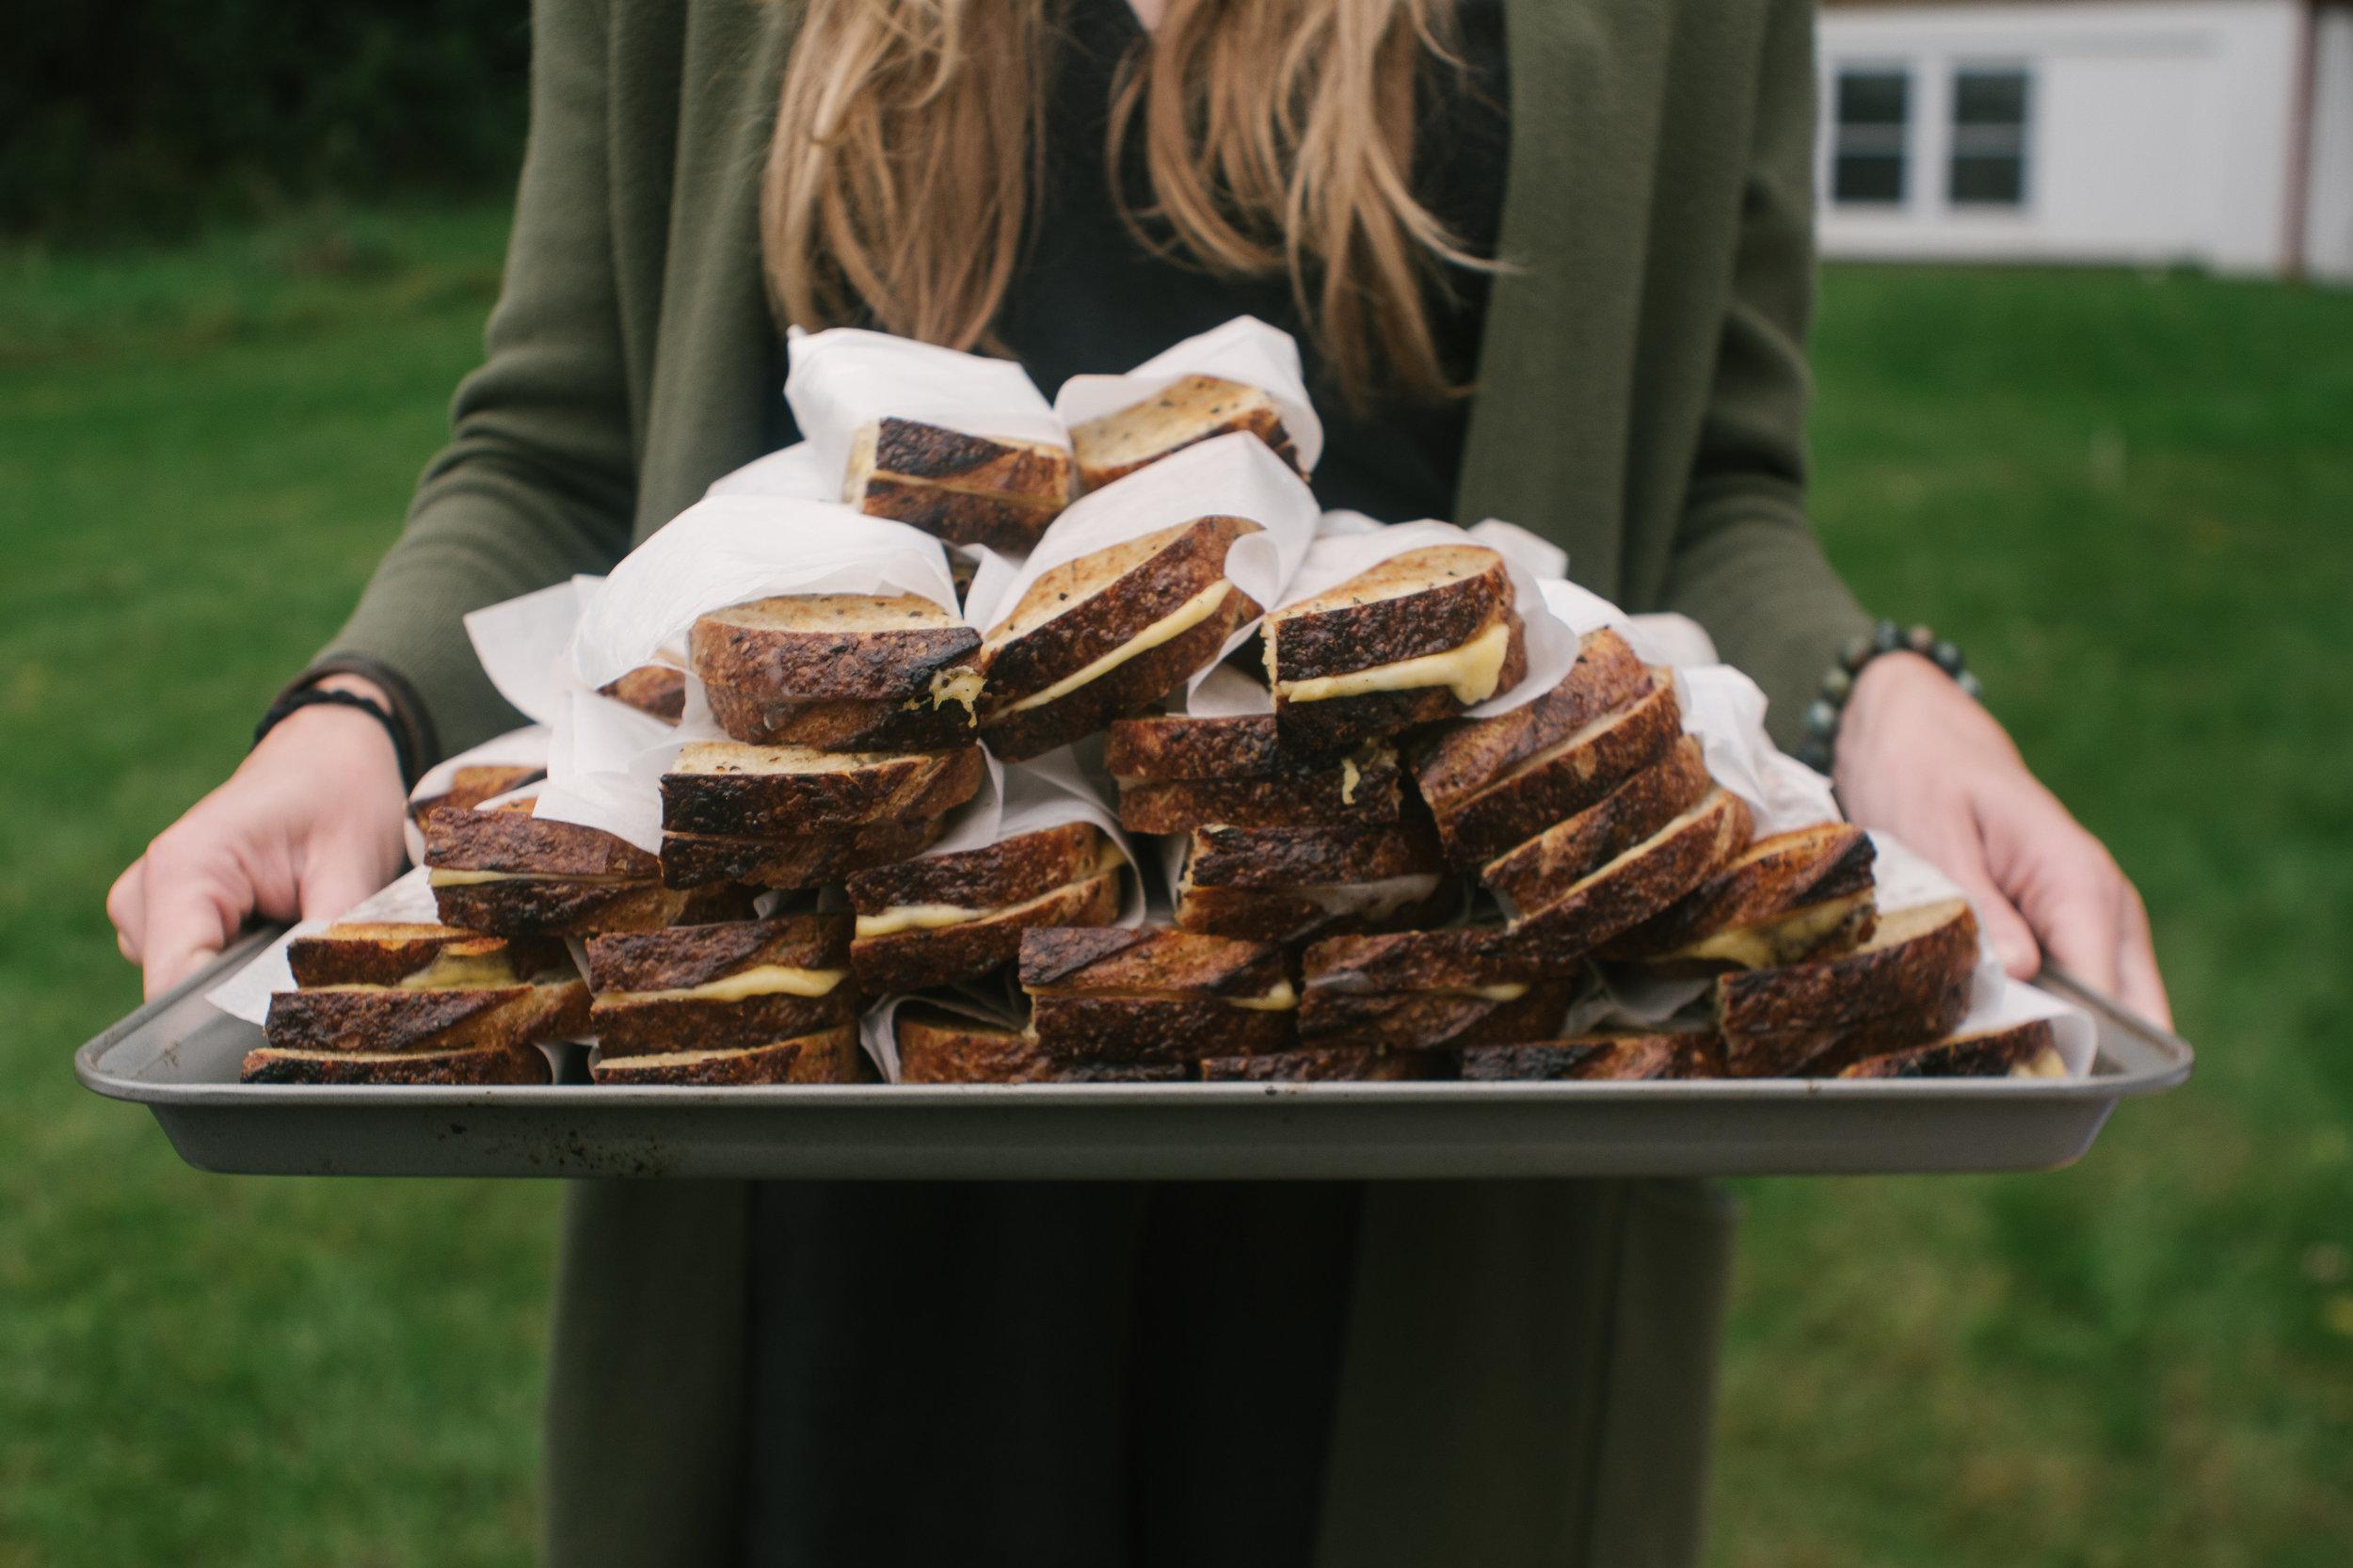 madison wedding flowers - grass-fed beef and lamb madison wisconsin - humane farm - grassfed